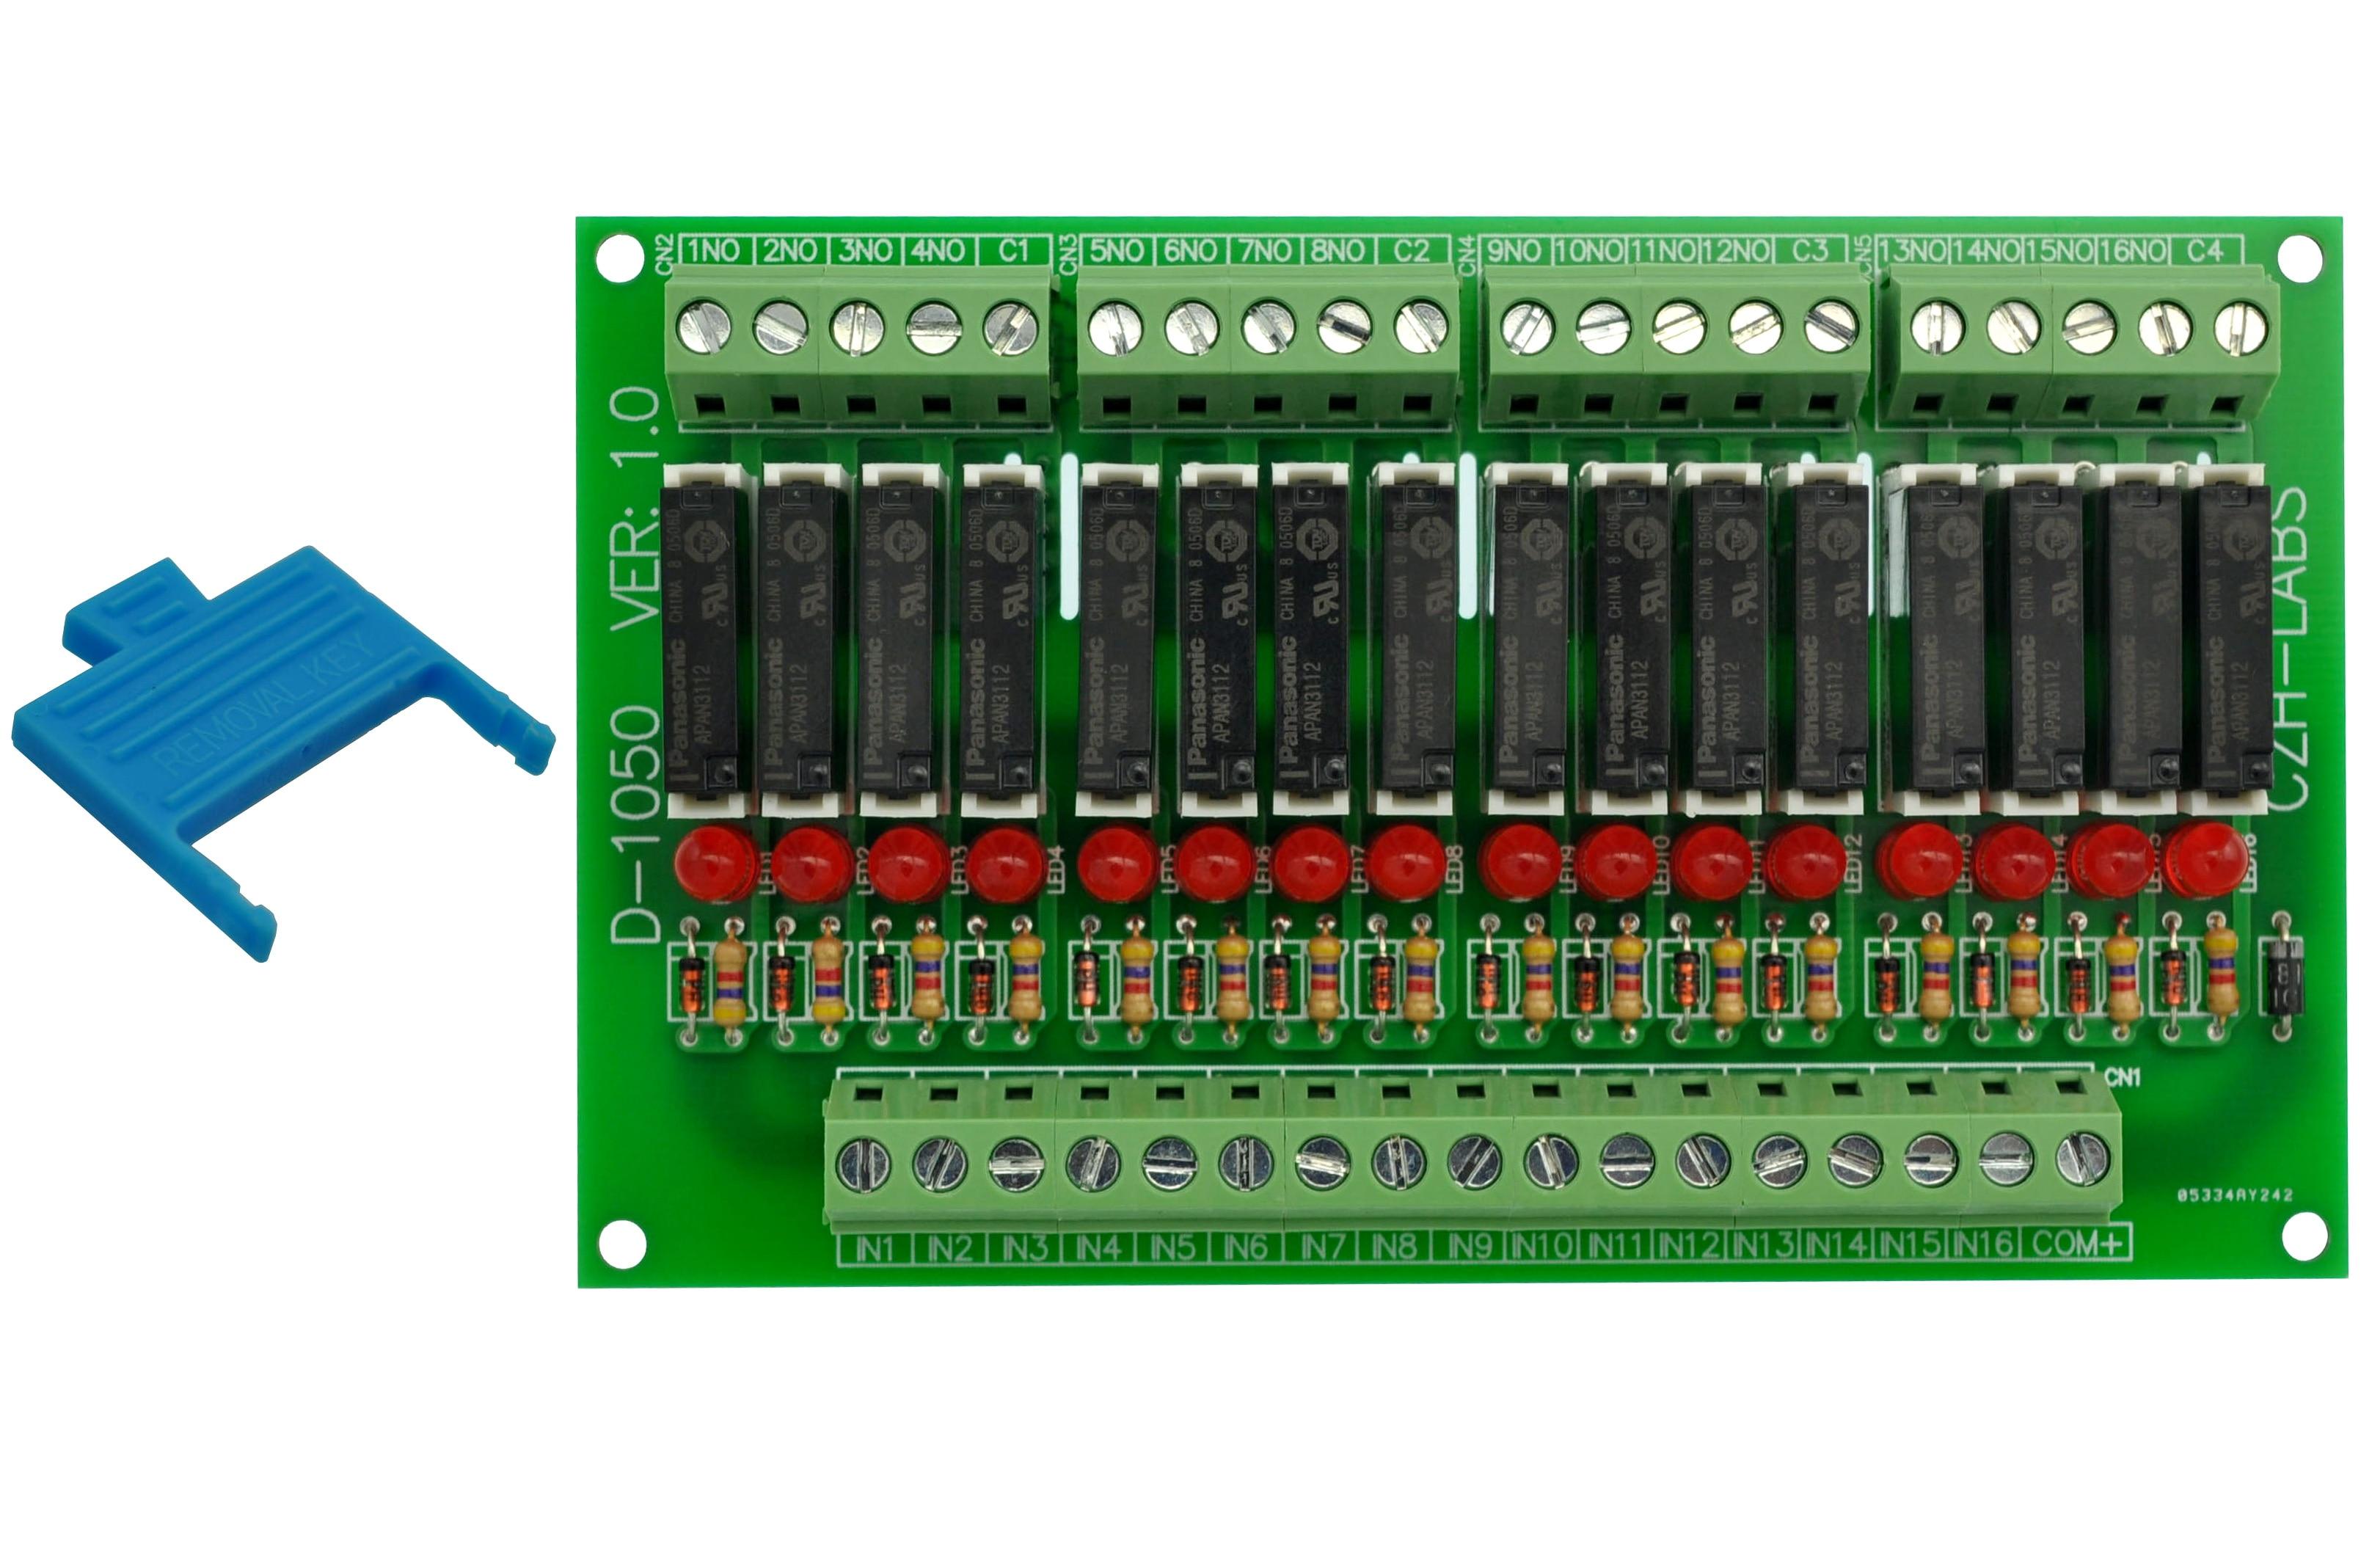 Slim Panel Mount DC12V Sink/NPN 16 SPST-NO 5A Power Relay Module, APAN3112